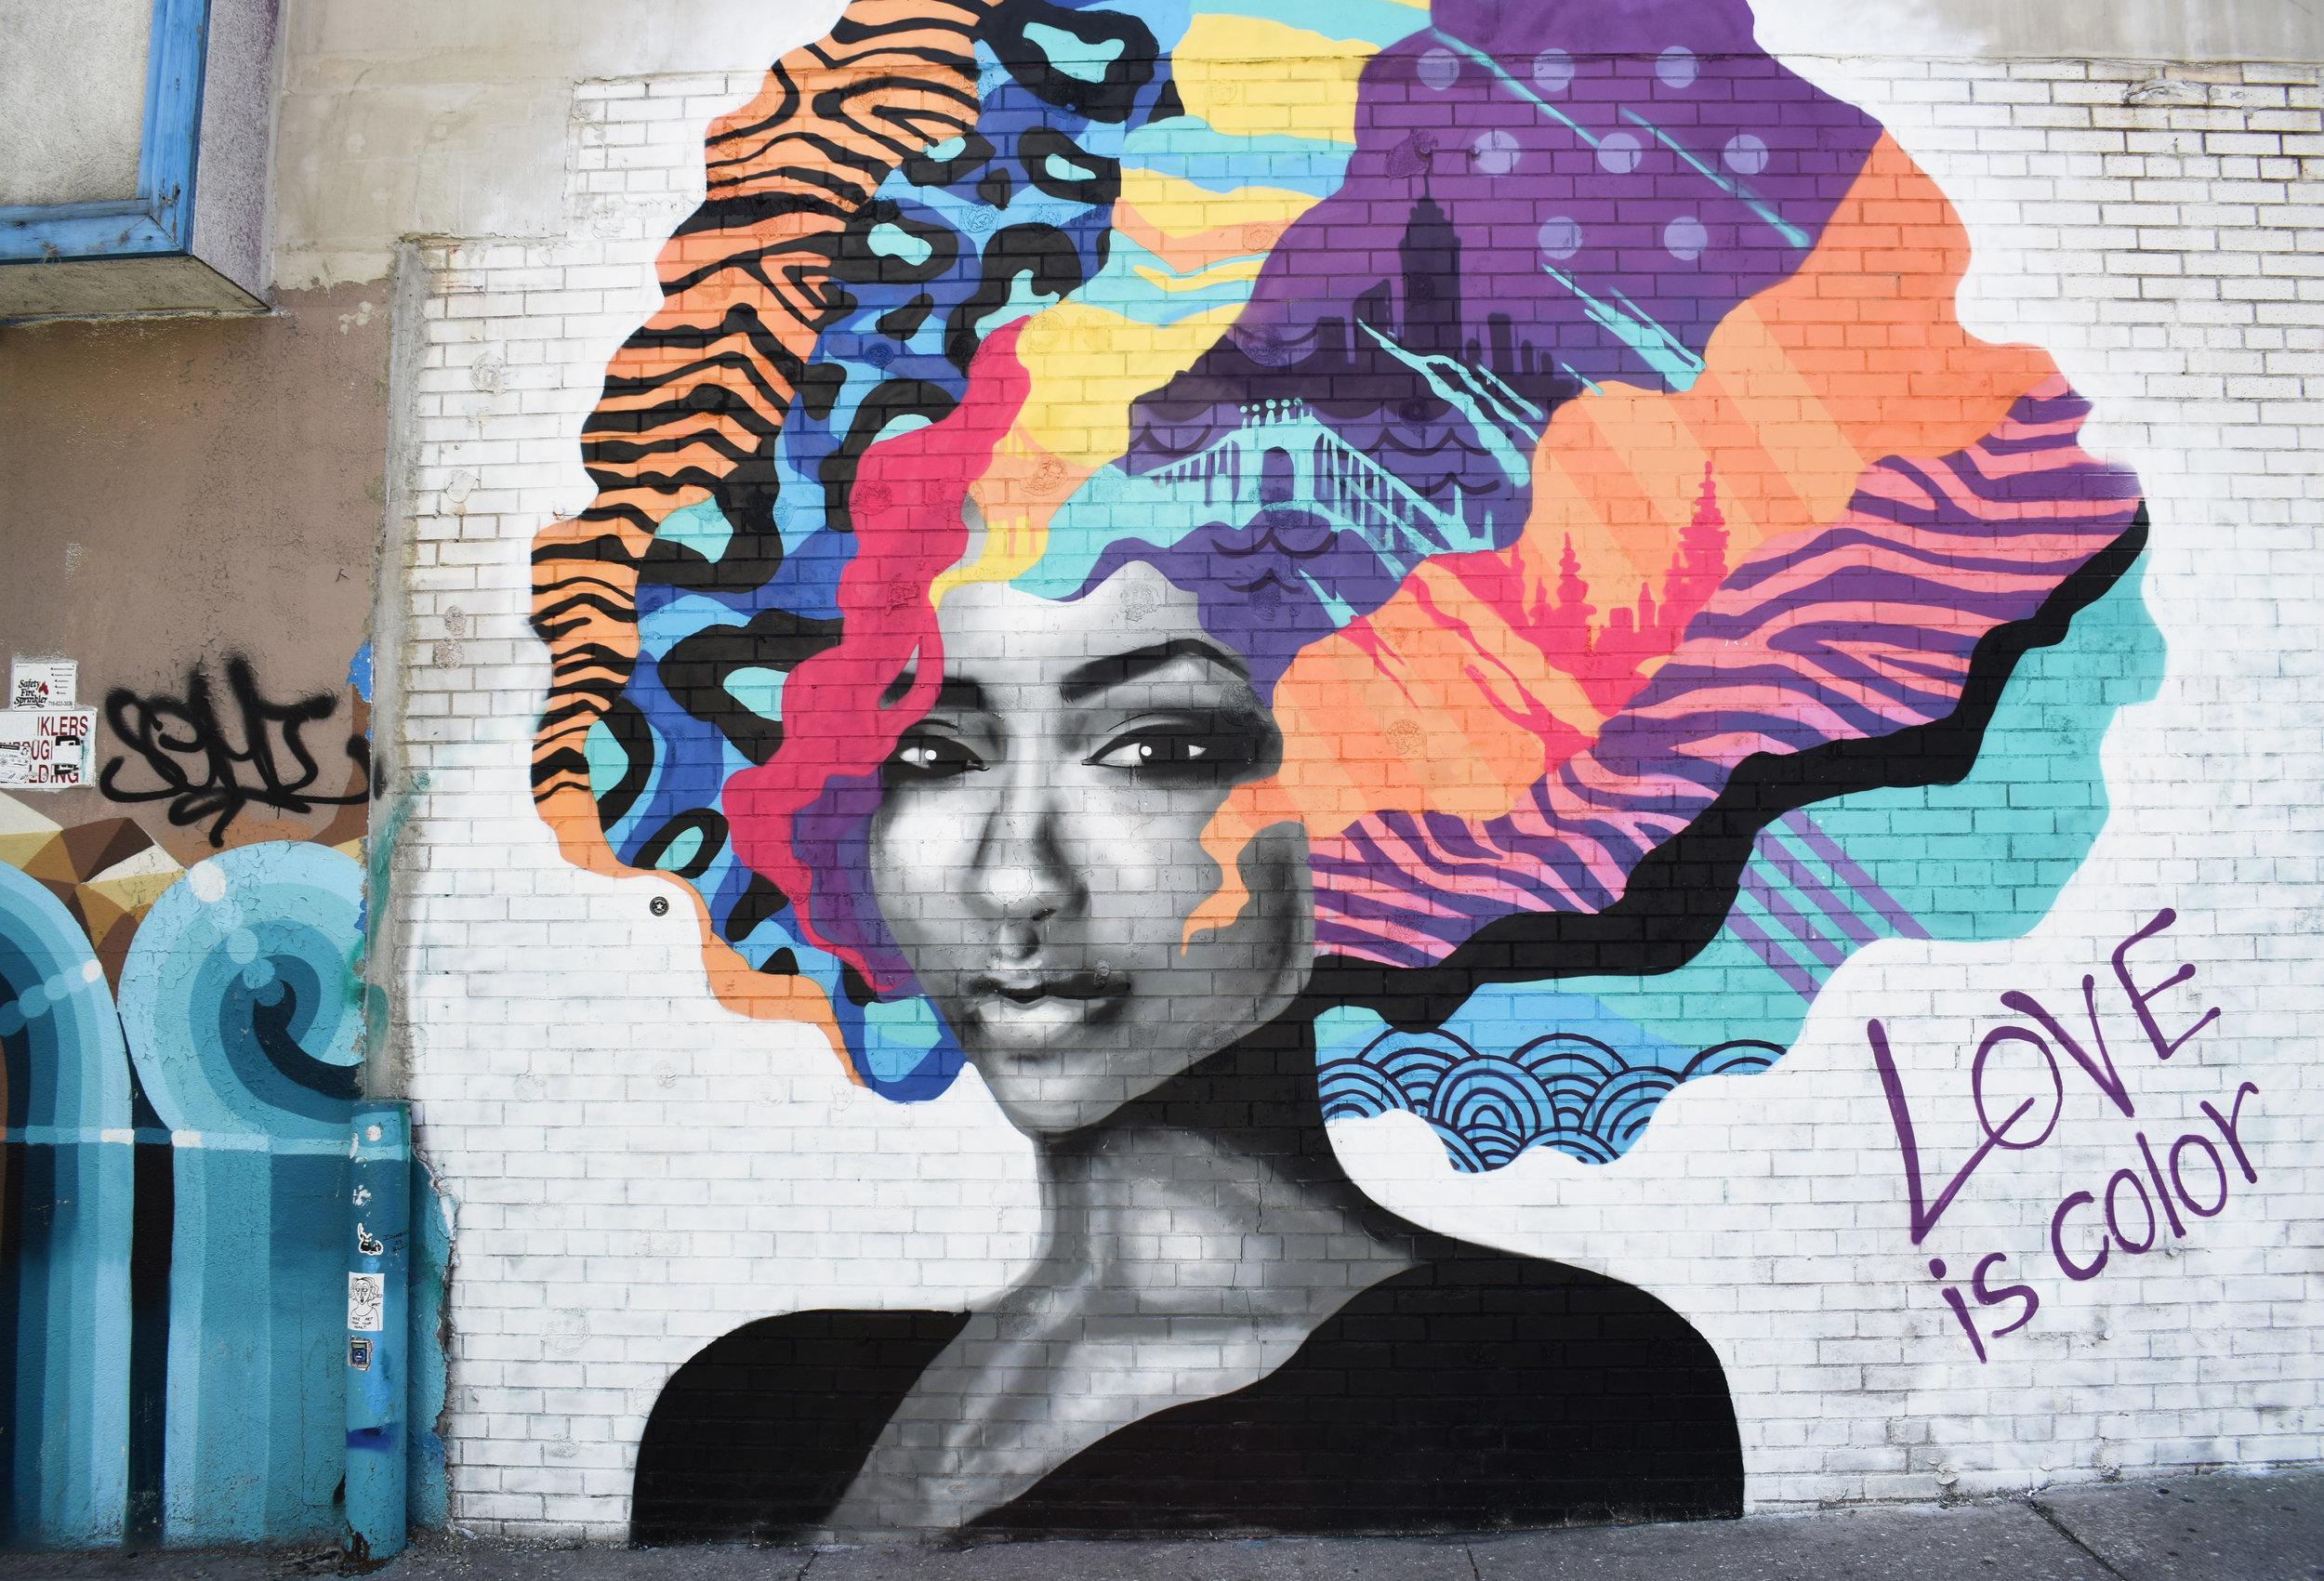 Love is color artwork